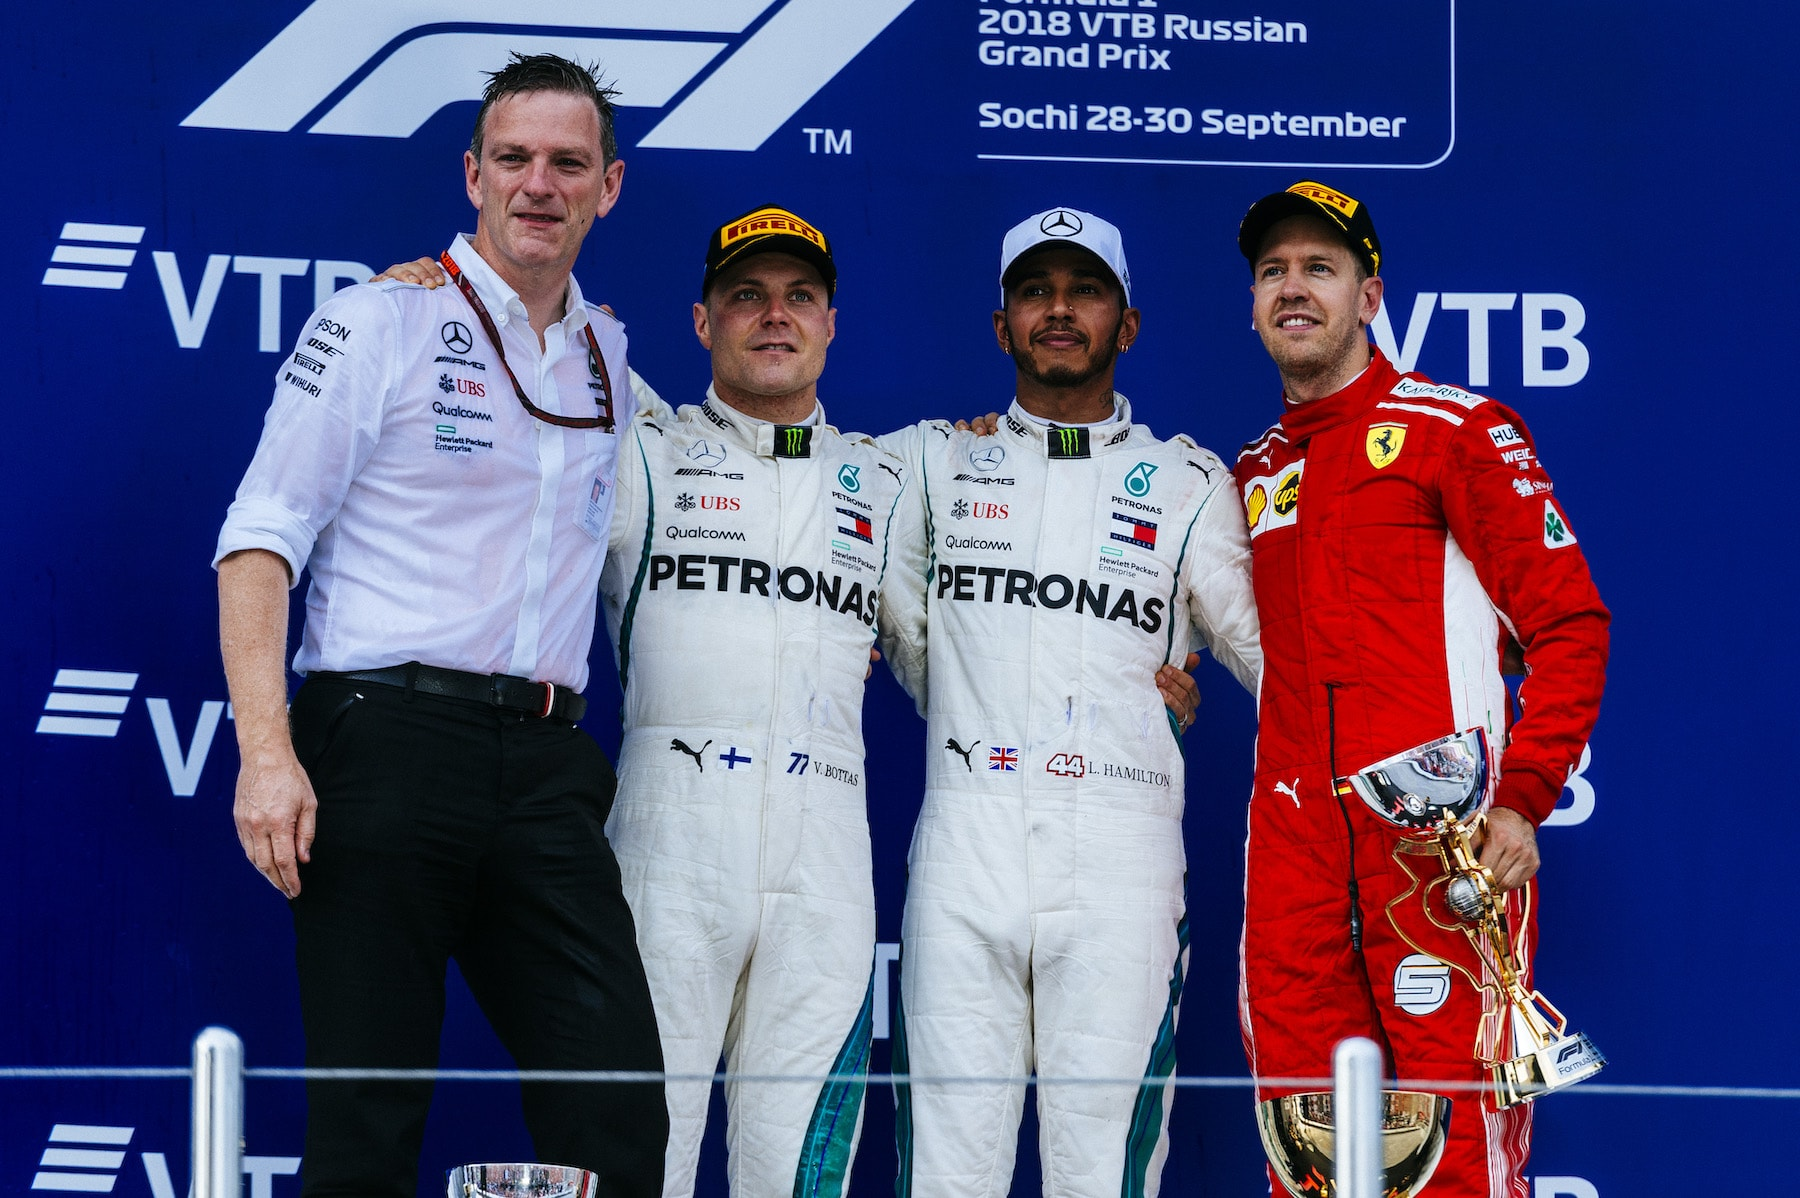 W 2018 Russian GP Podium copy.jpg